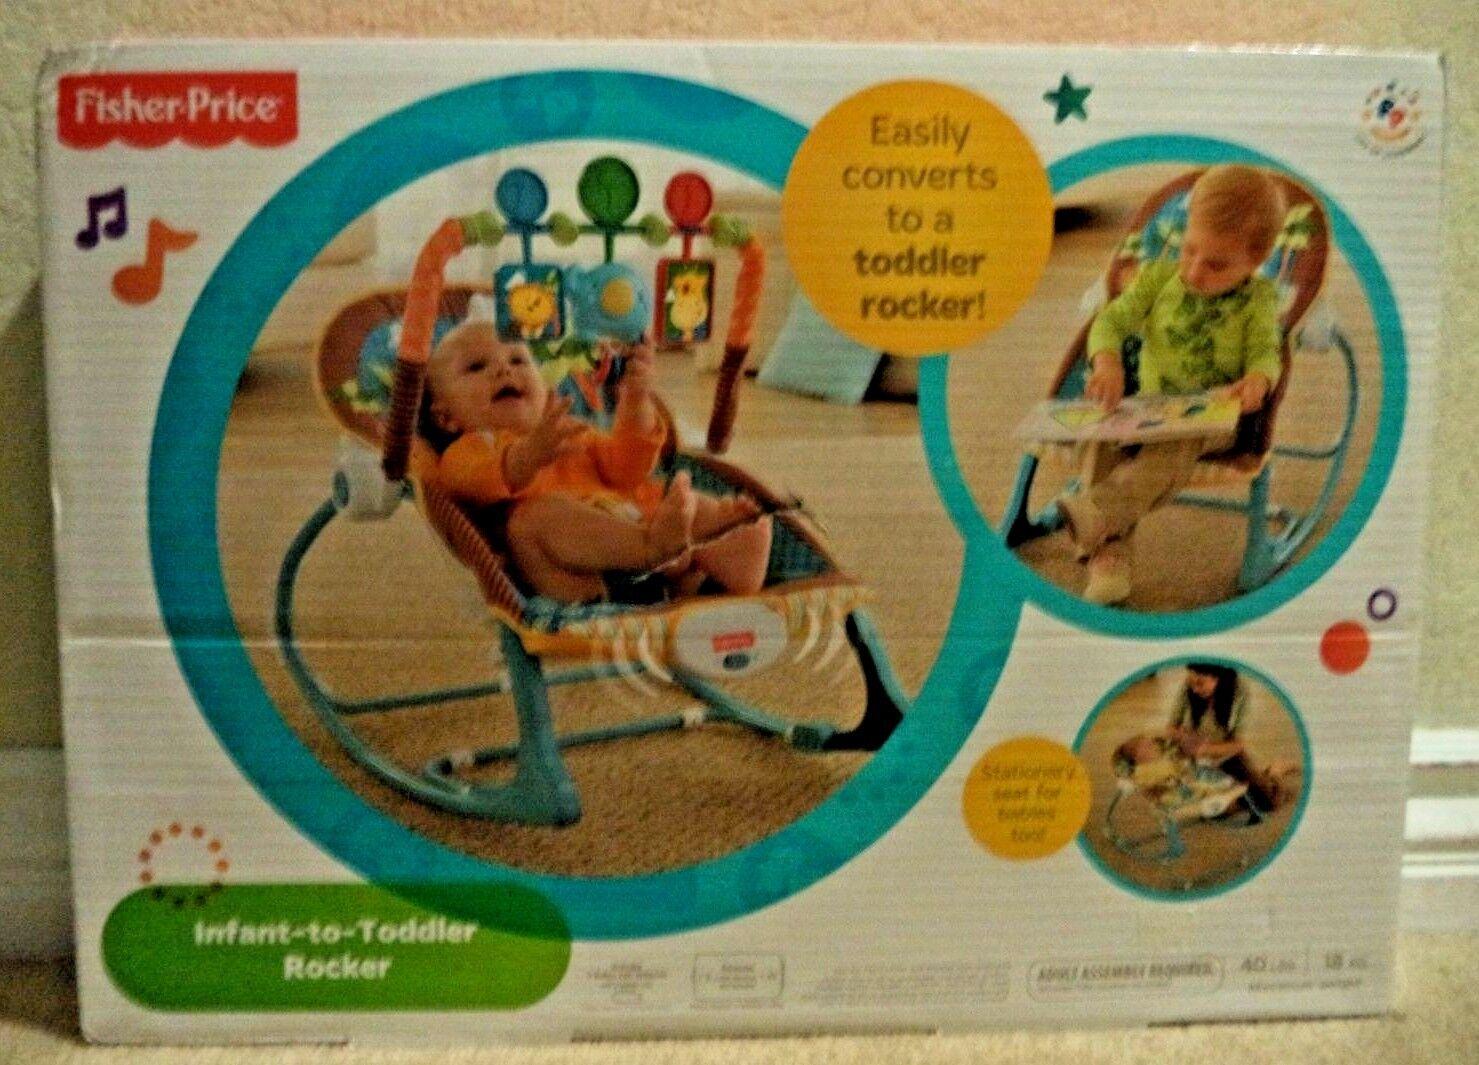 Fisher-Price Infant-to-Toddler Rocker, Jungle Fun